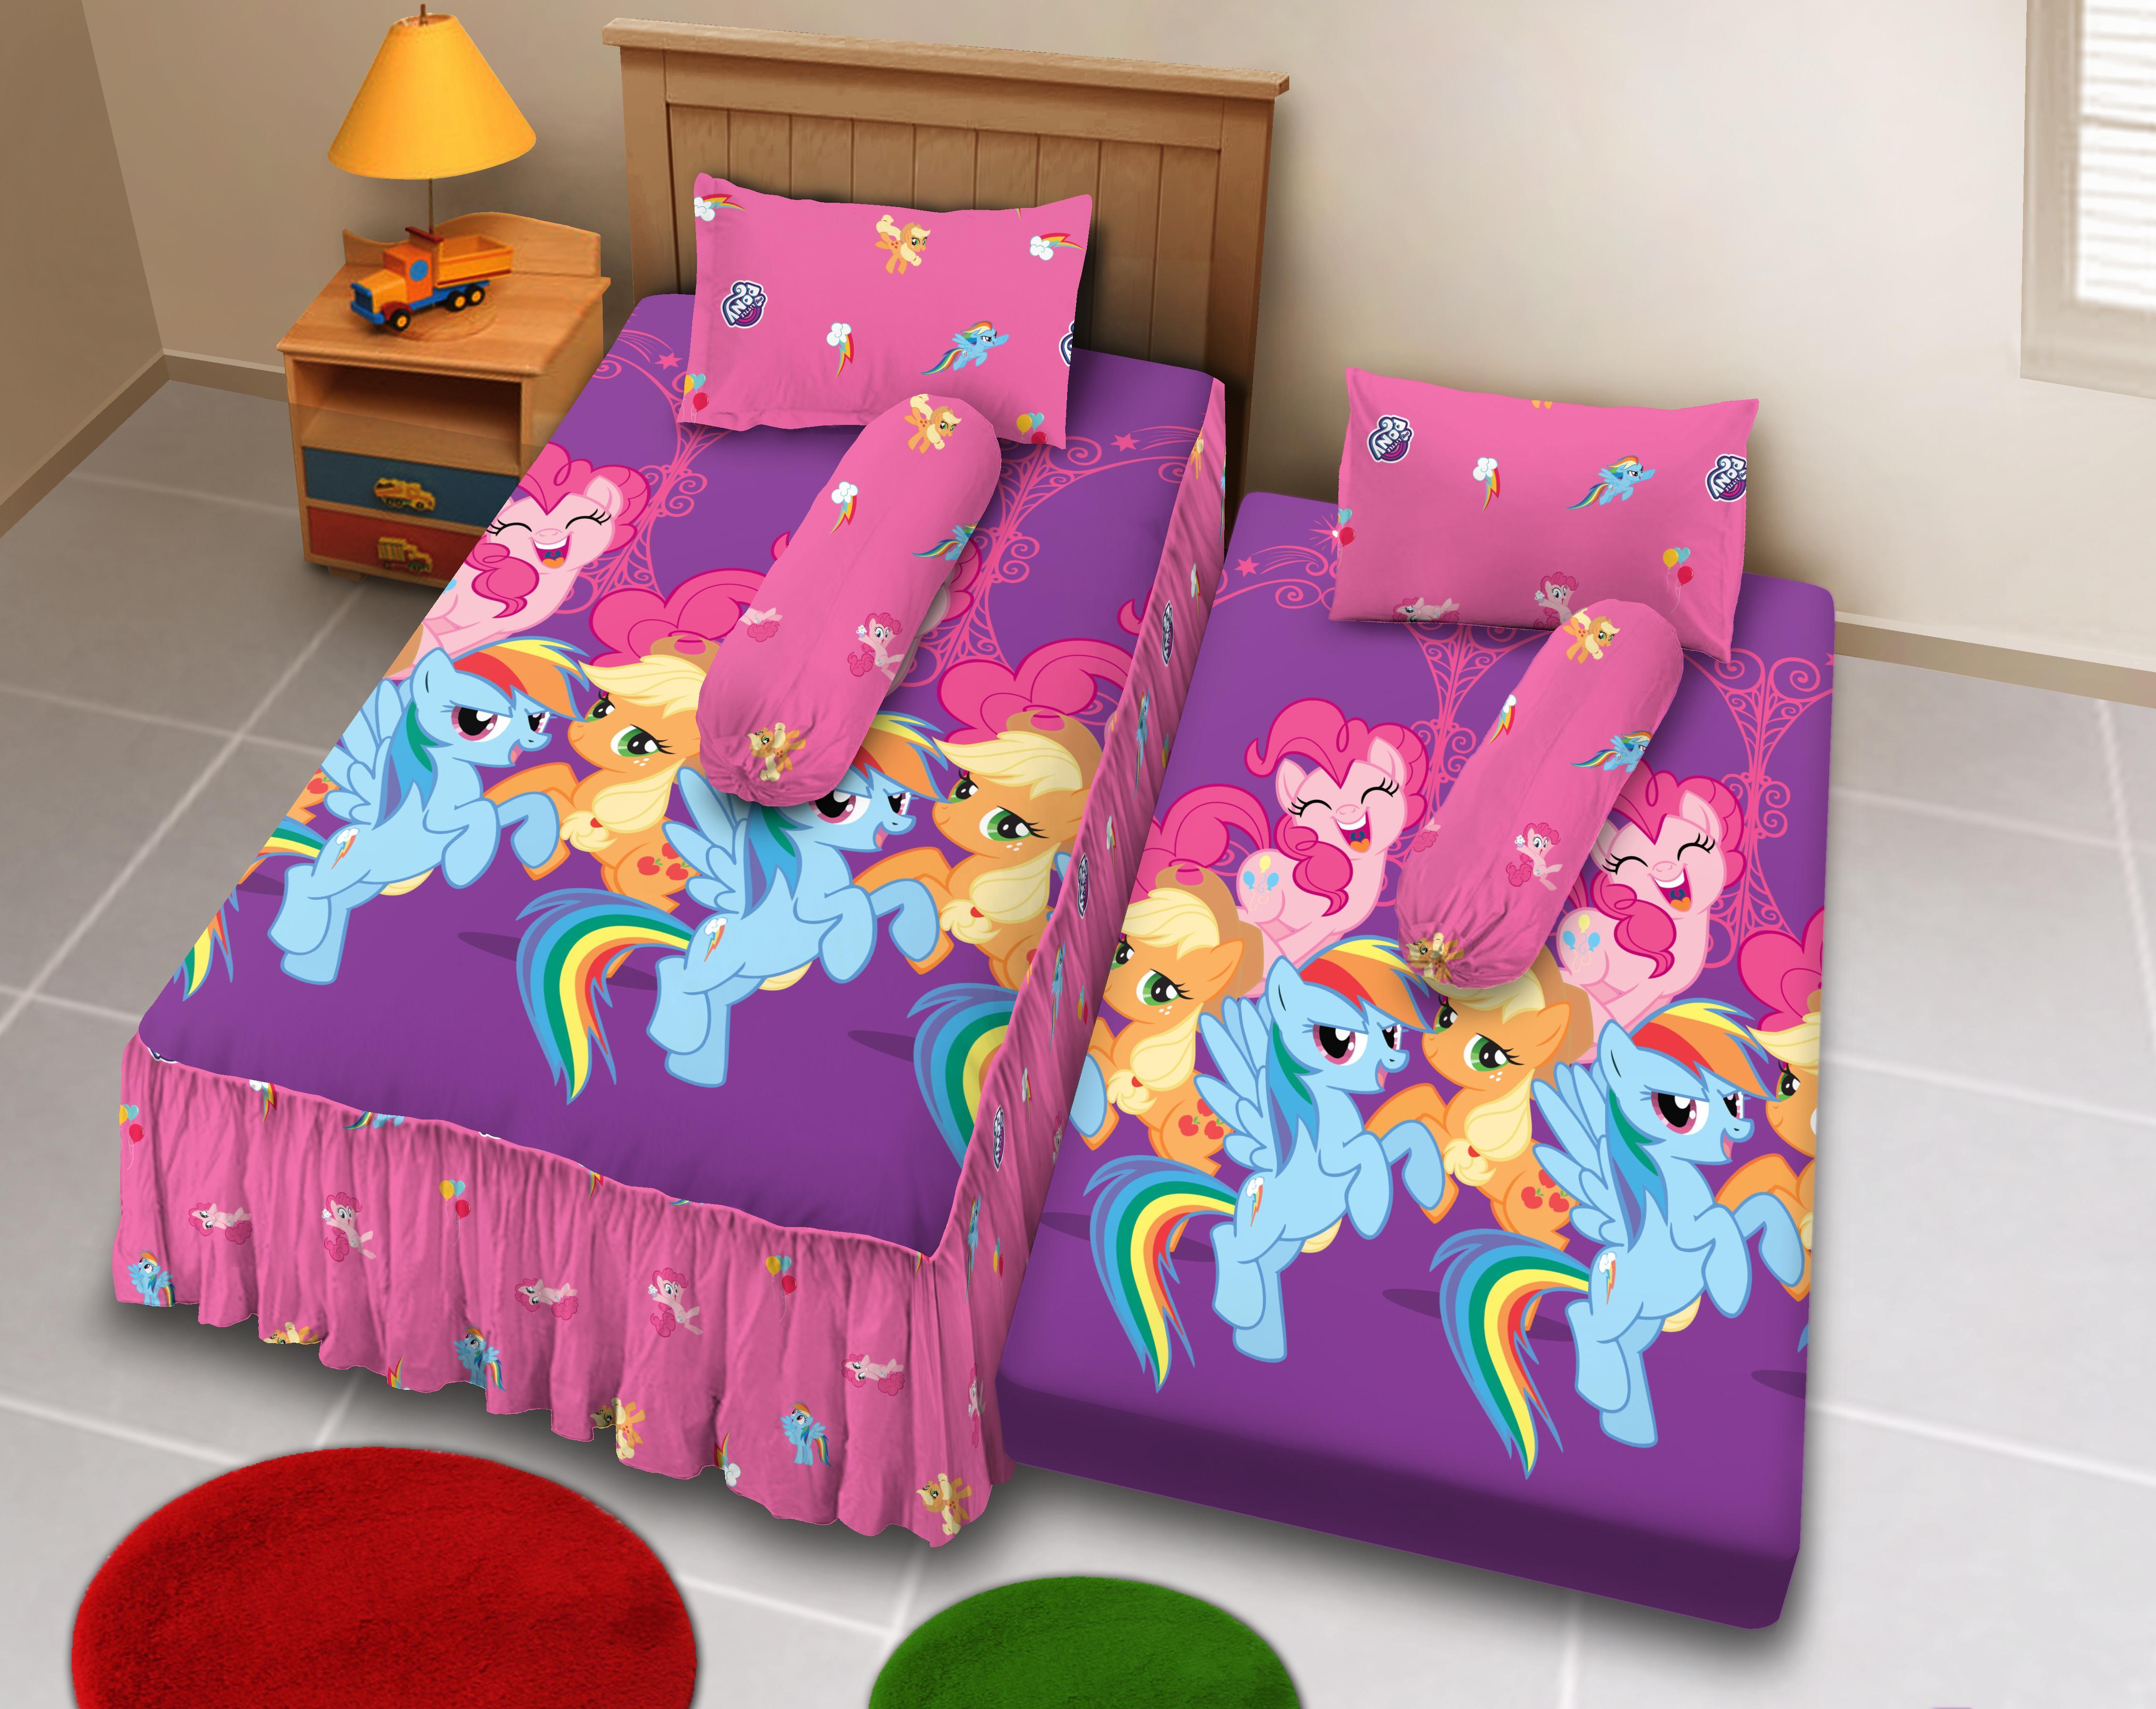 Cek Harga Baru Sprei Ukuran 180 X 200 Classic Kuda Pony Terkini Kintakun Dluxe 120 Single Pisano 2in1 Little